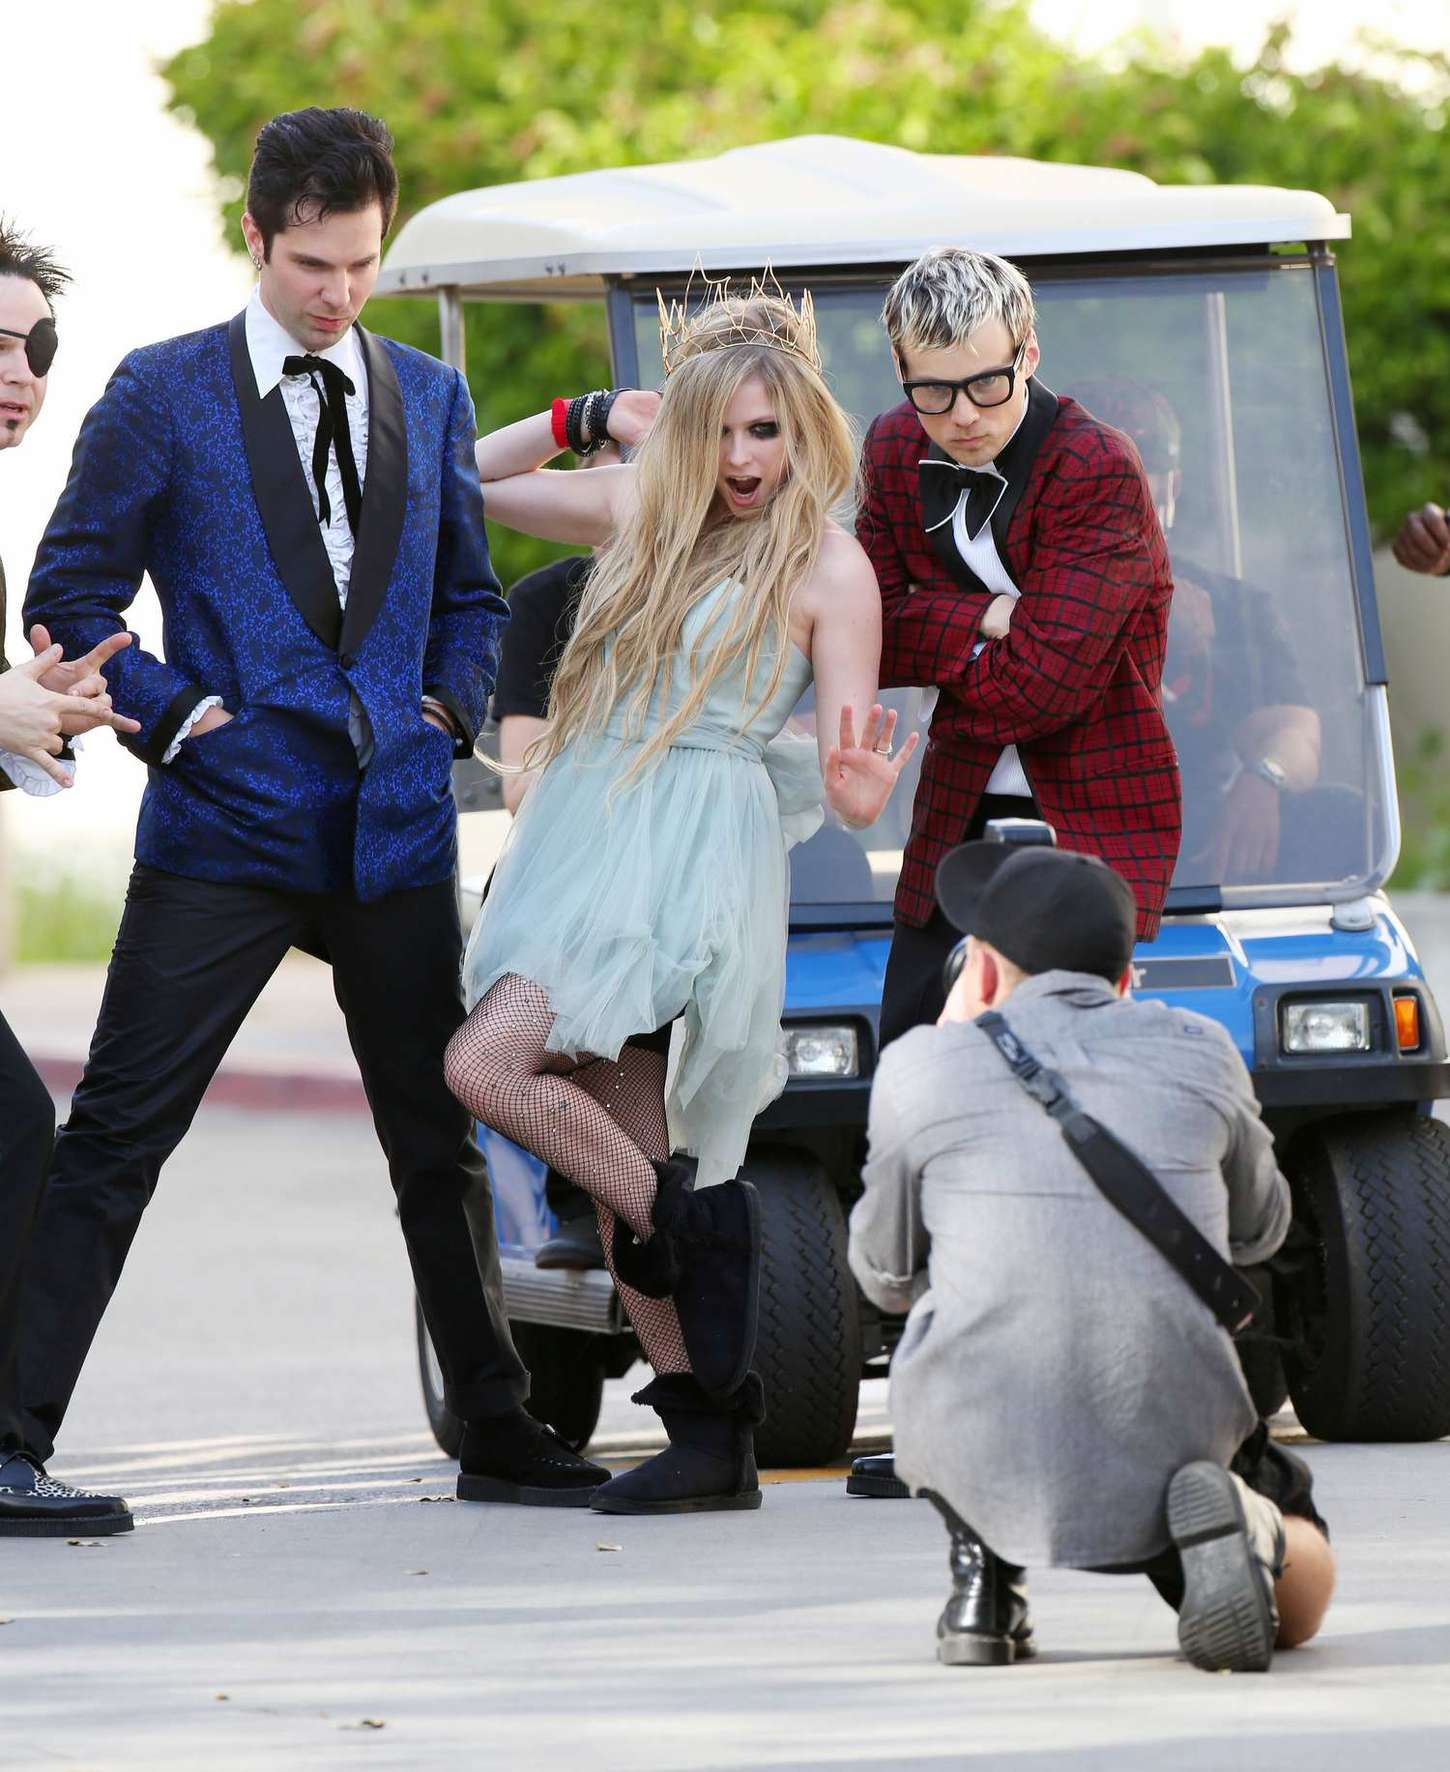 Avril Lavigne 2015 : Avril Lavigne: Filming New Music Video -08